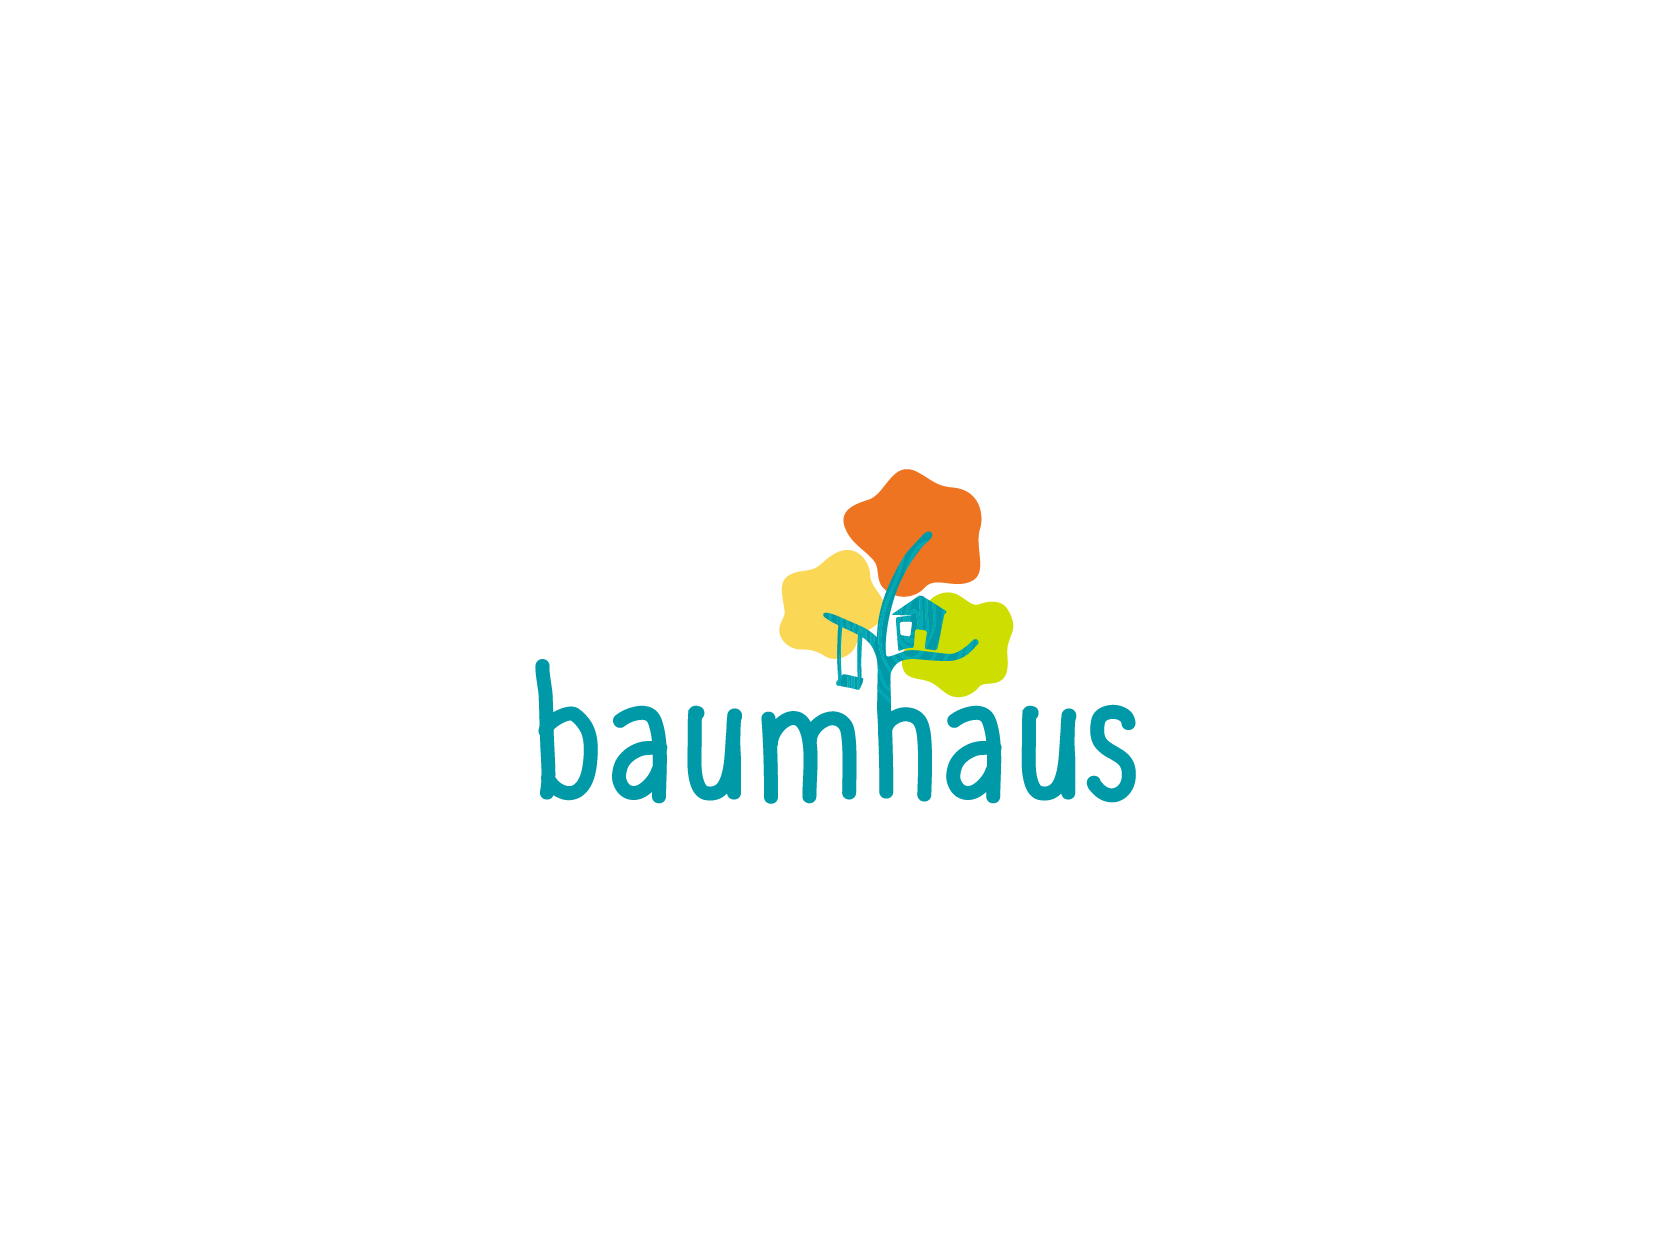 logos_website-02.png